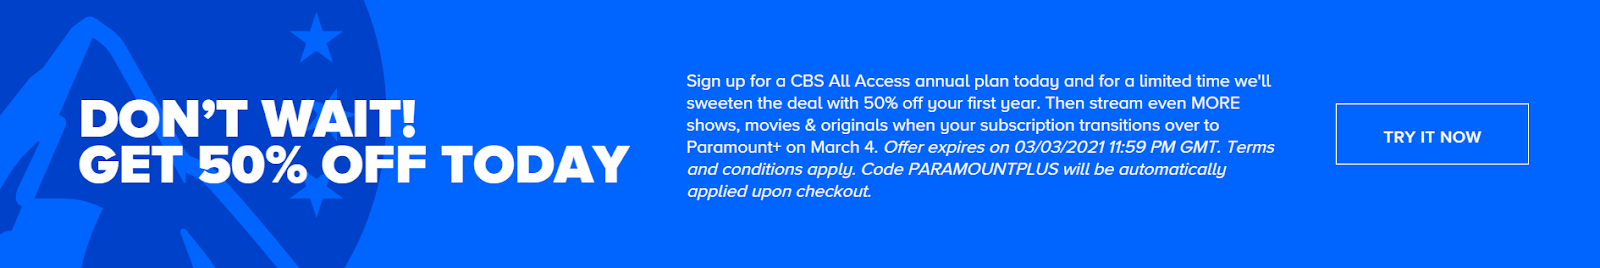 Pricing of Paramount Plus